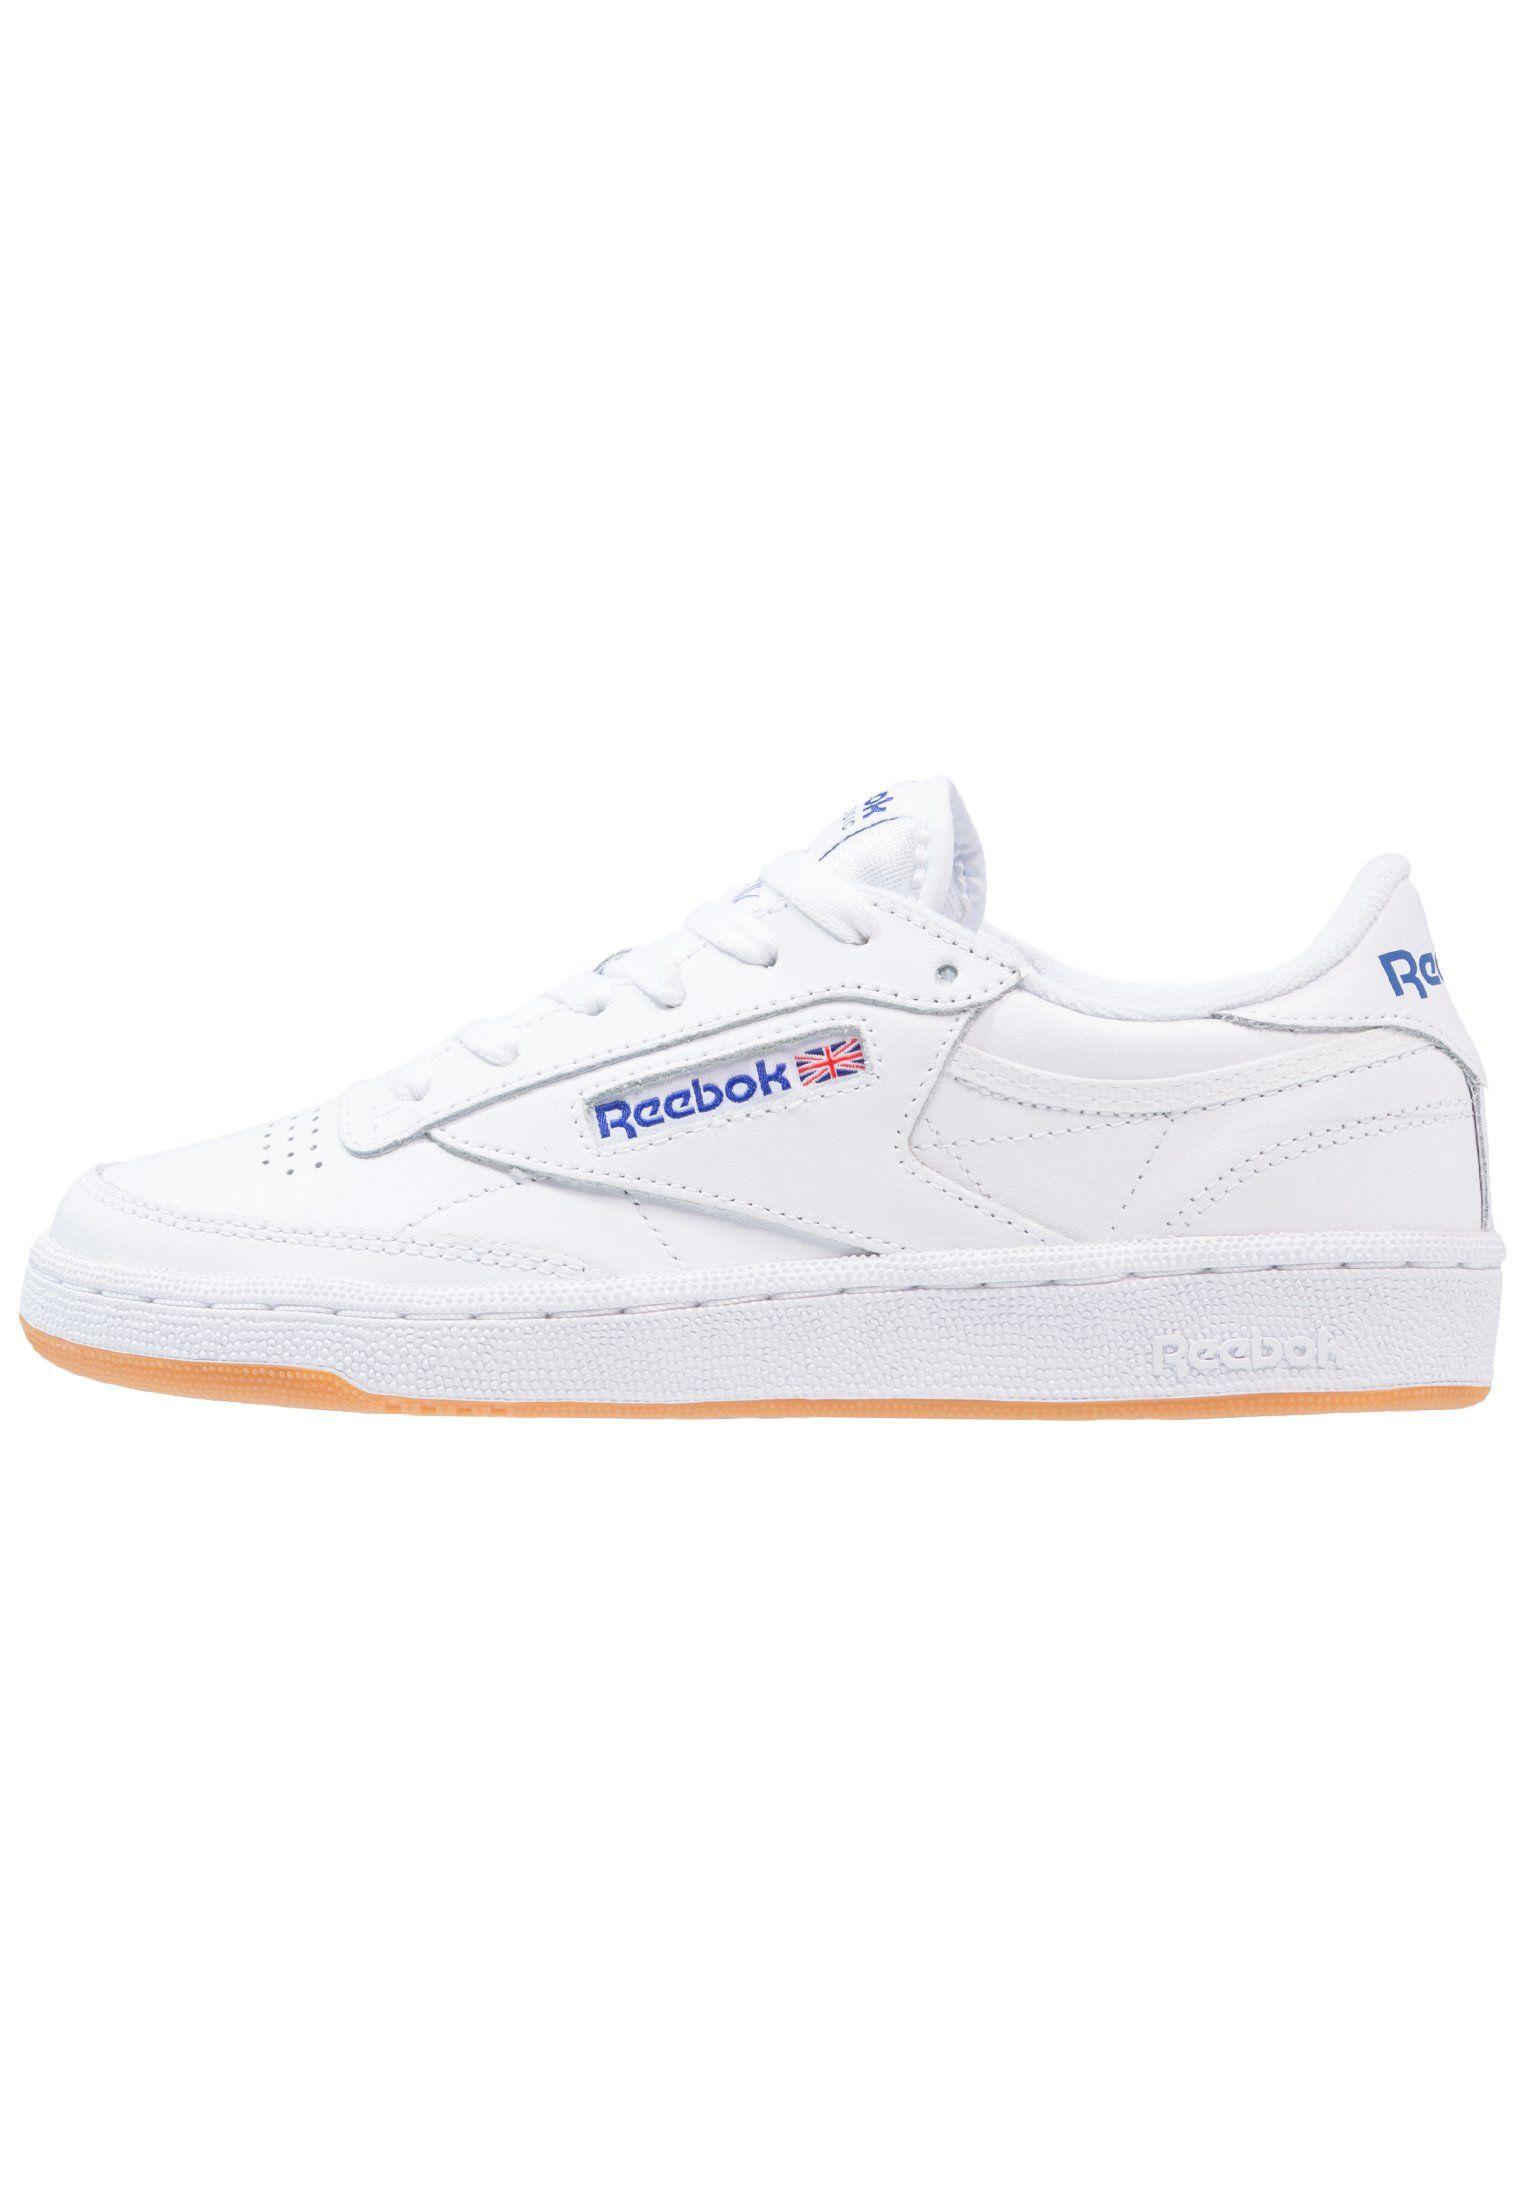 Chaussures De Sport Club Laag C 85 Offwhite Reebok Classique AAO1ySppZZ